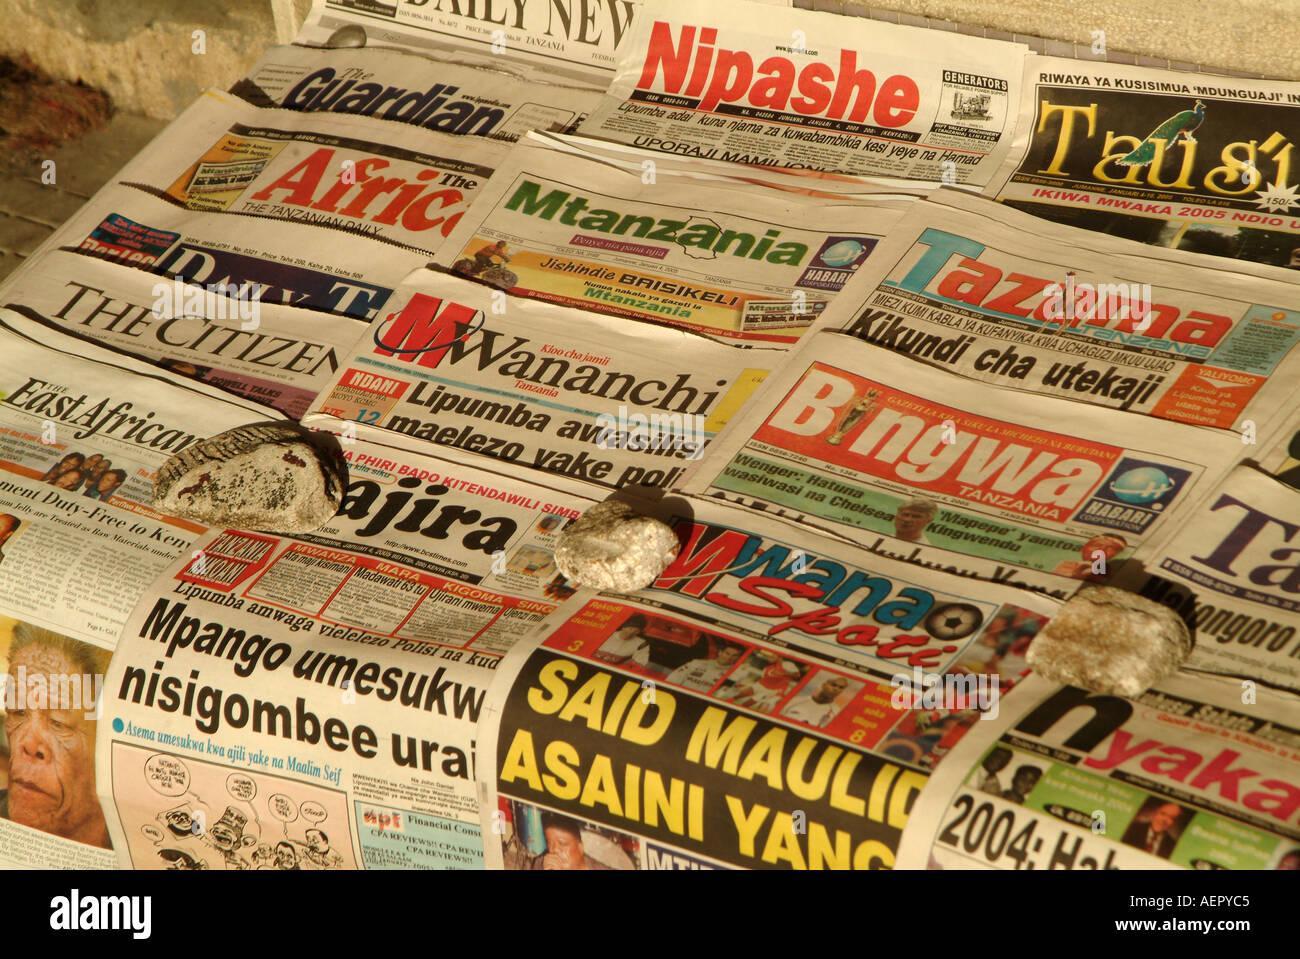 Swahili And English High Resolution Stock Photography And Images Alamy